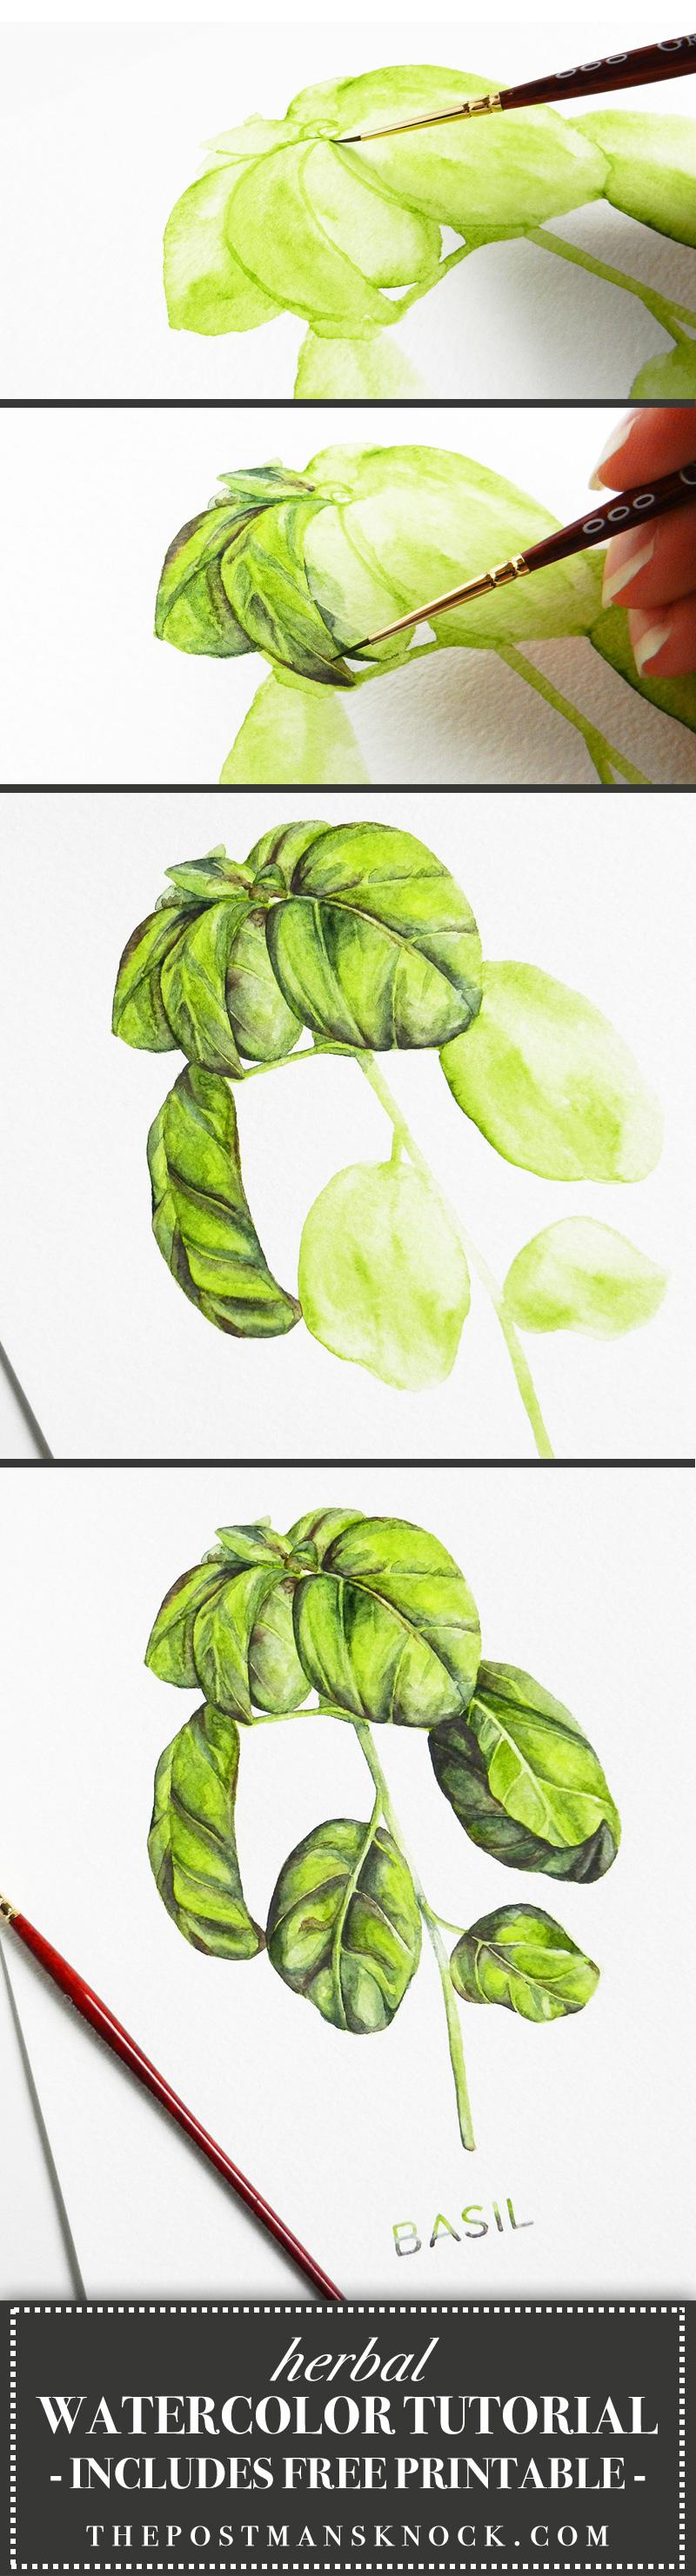 Herbal Watercolor Tutorial + a Free Printable | The Postman\'s Knock